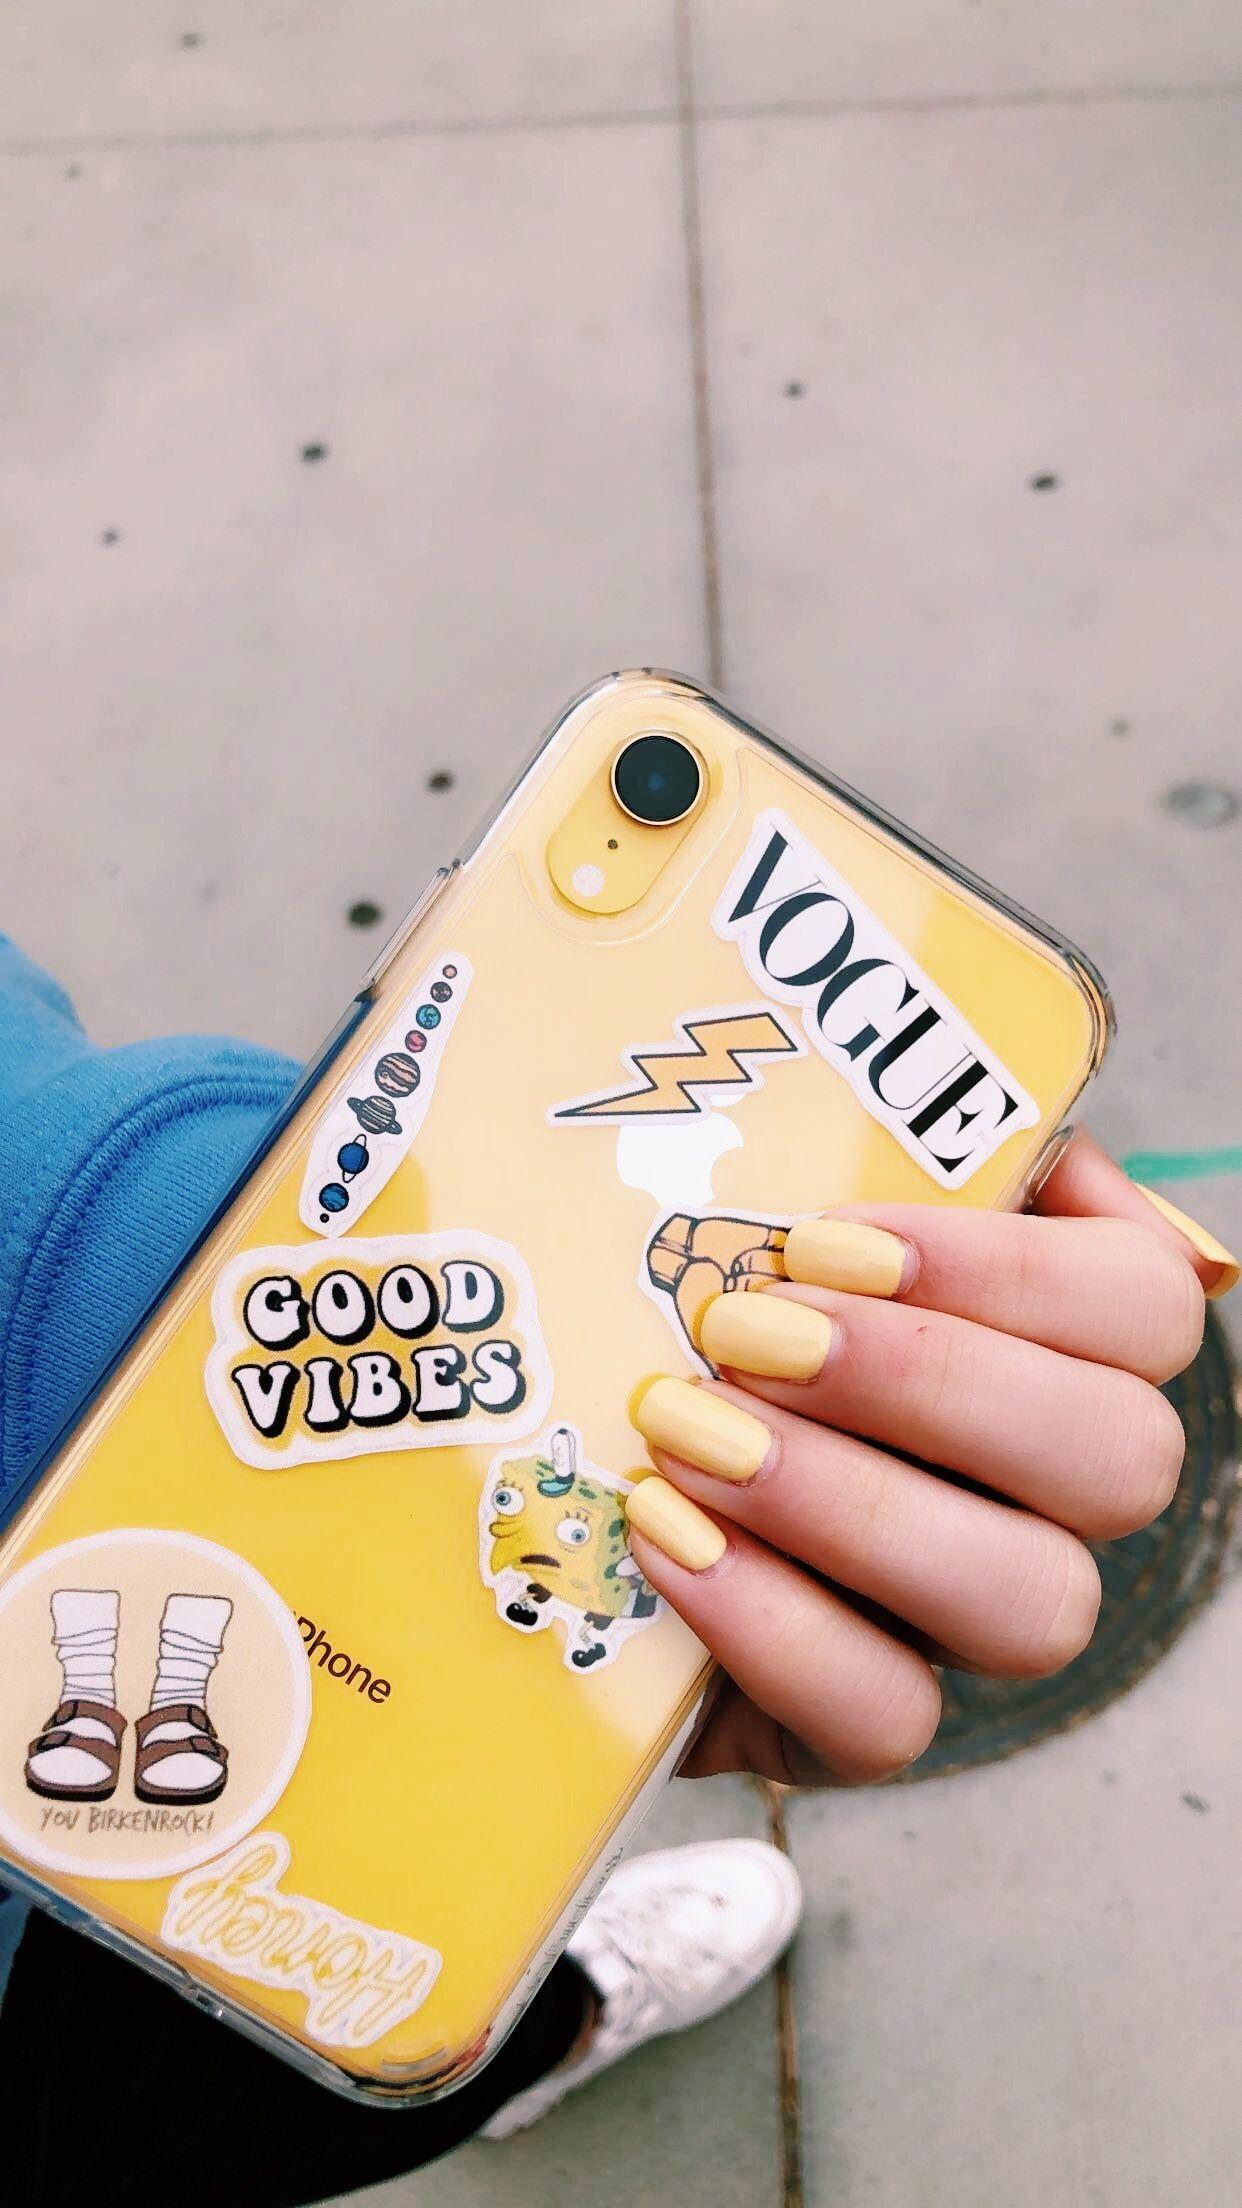 Wallpaper Iphone Xr Yellow